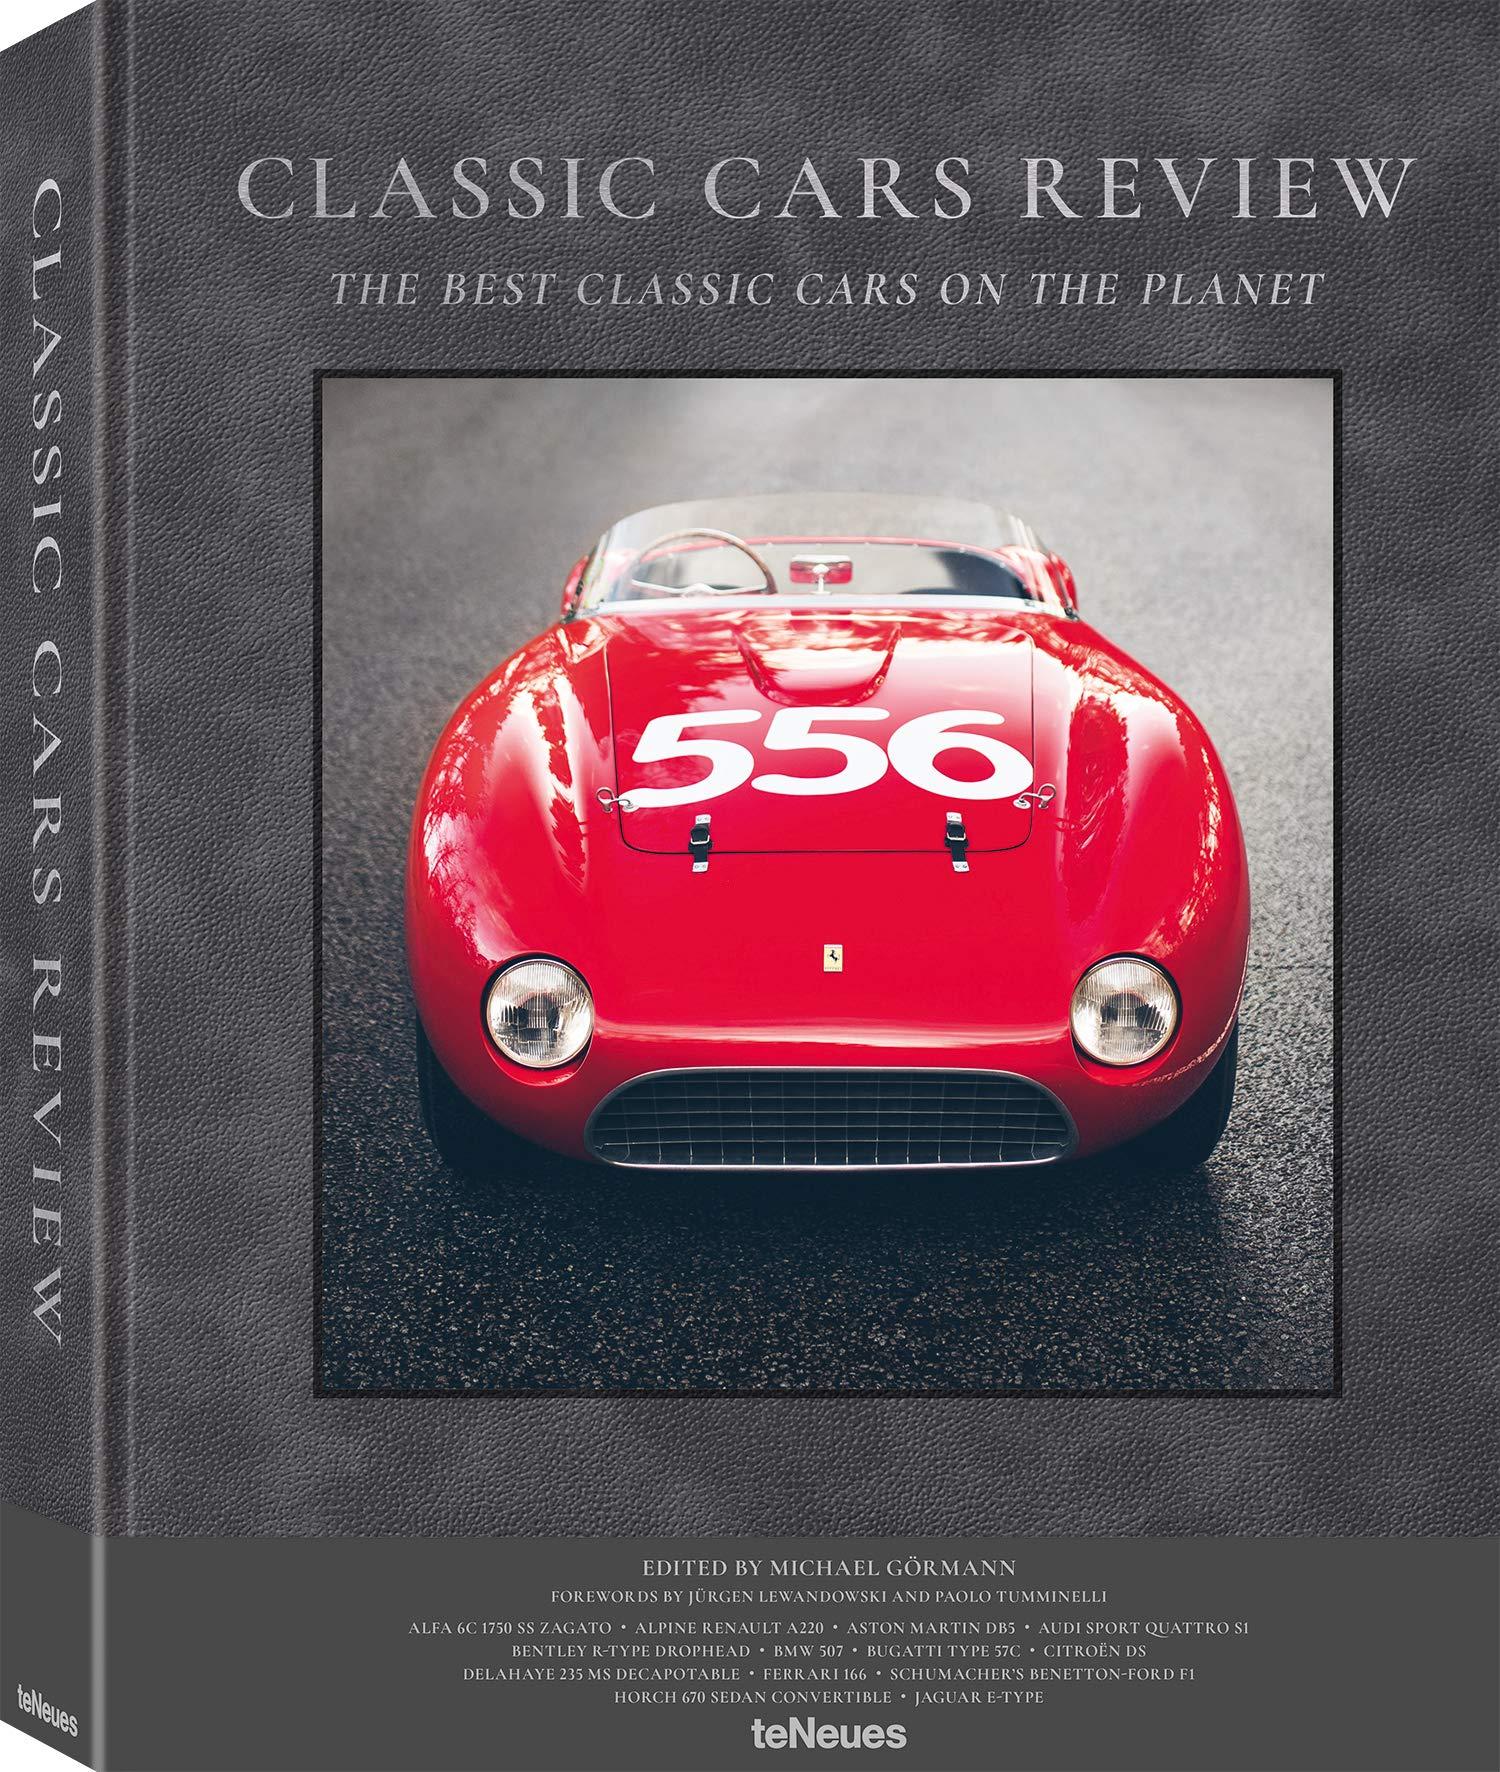 LIVRO-THE-BEST-CLASSIC-CARS